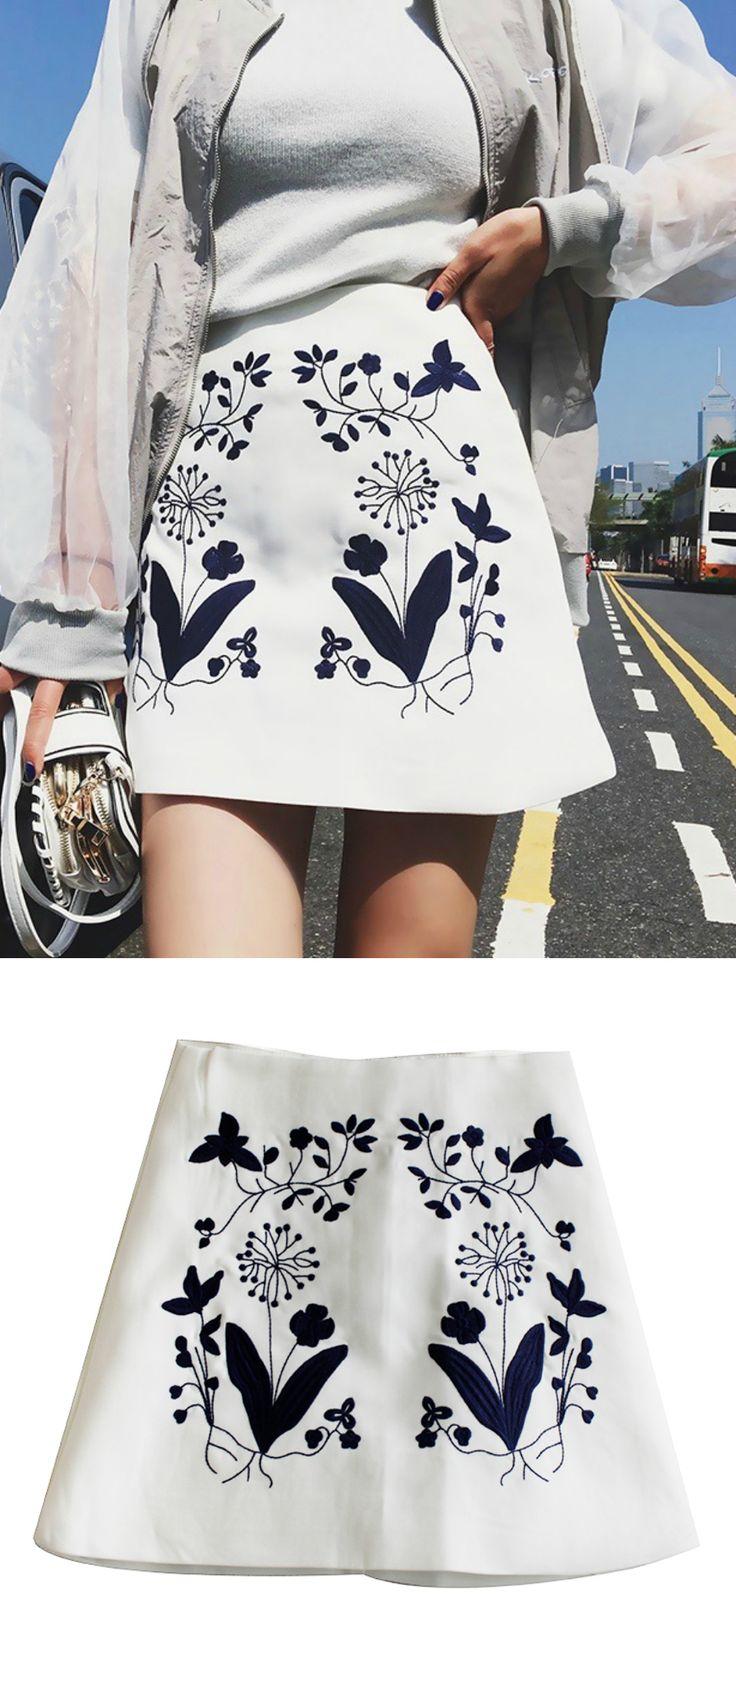 25 Best Ideas About Romper Skirt On Pinterest Jumpsuits Rompers Women 39 S Jumpsuits